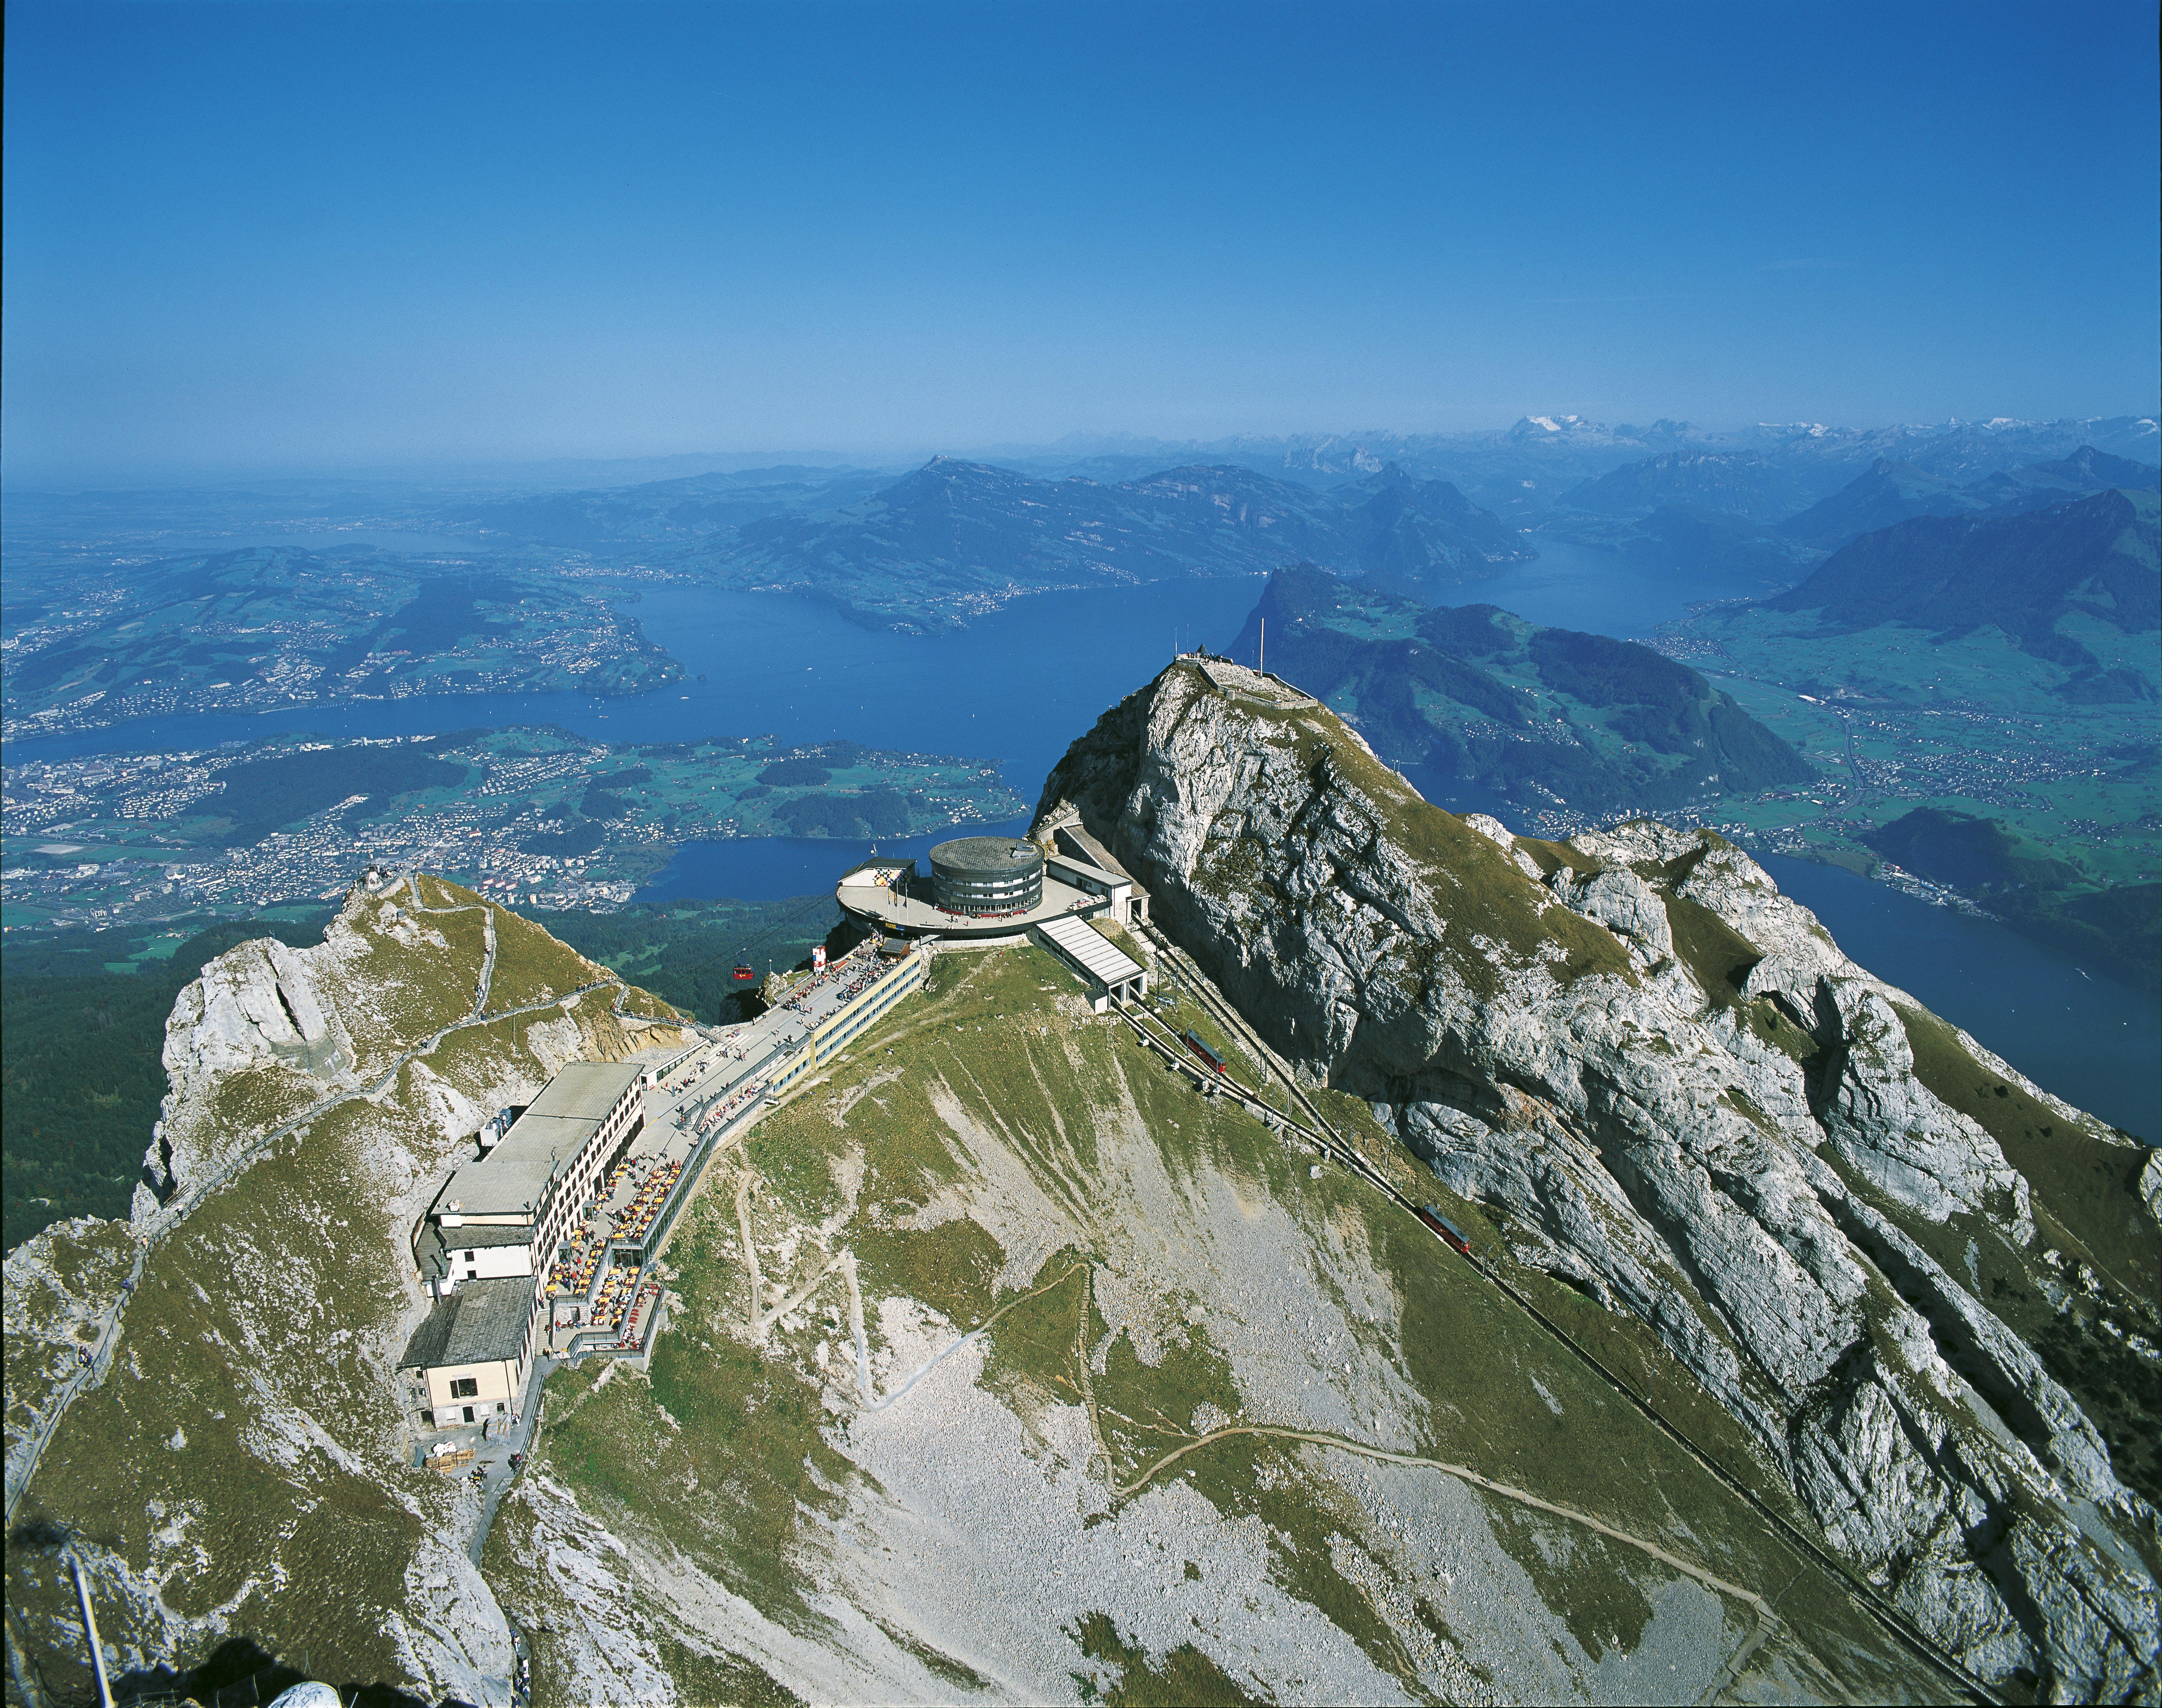 Switzerland, Lucene, Mount Pilatus